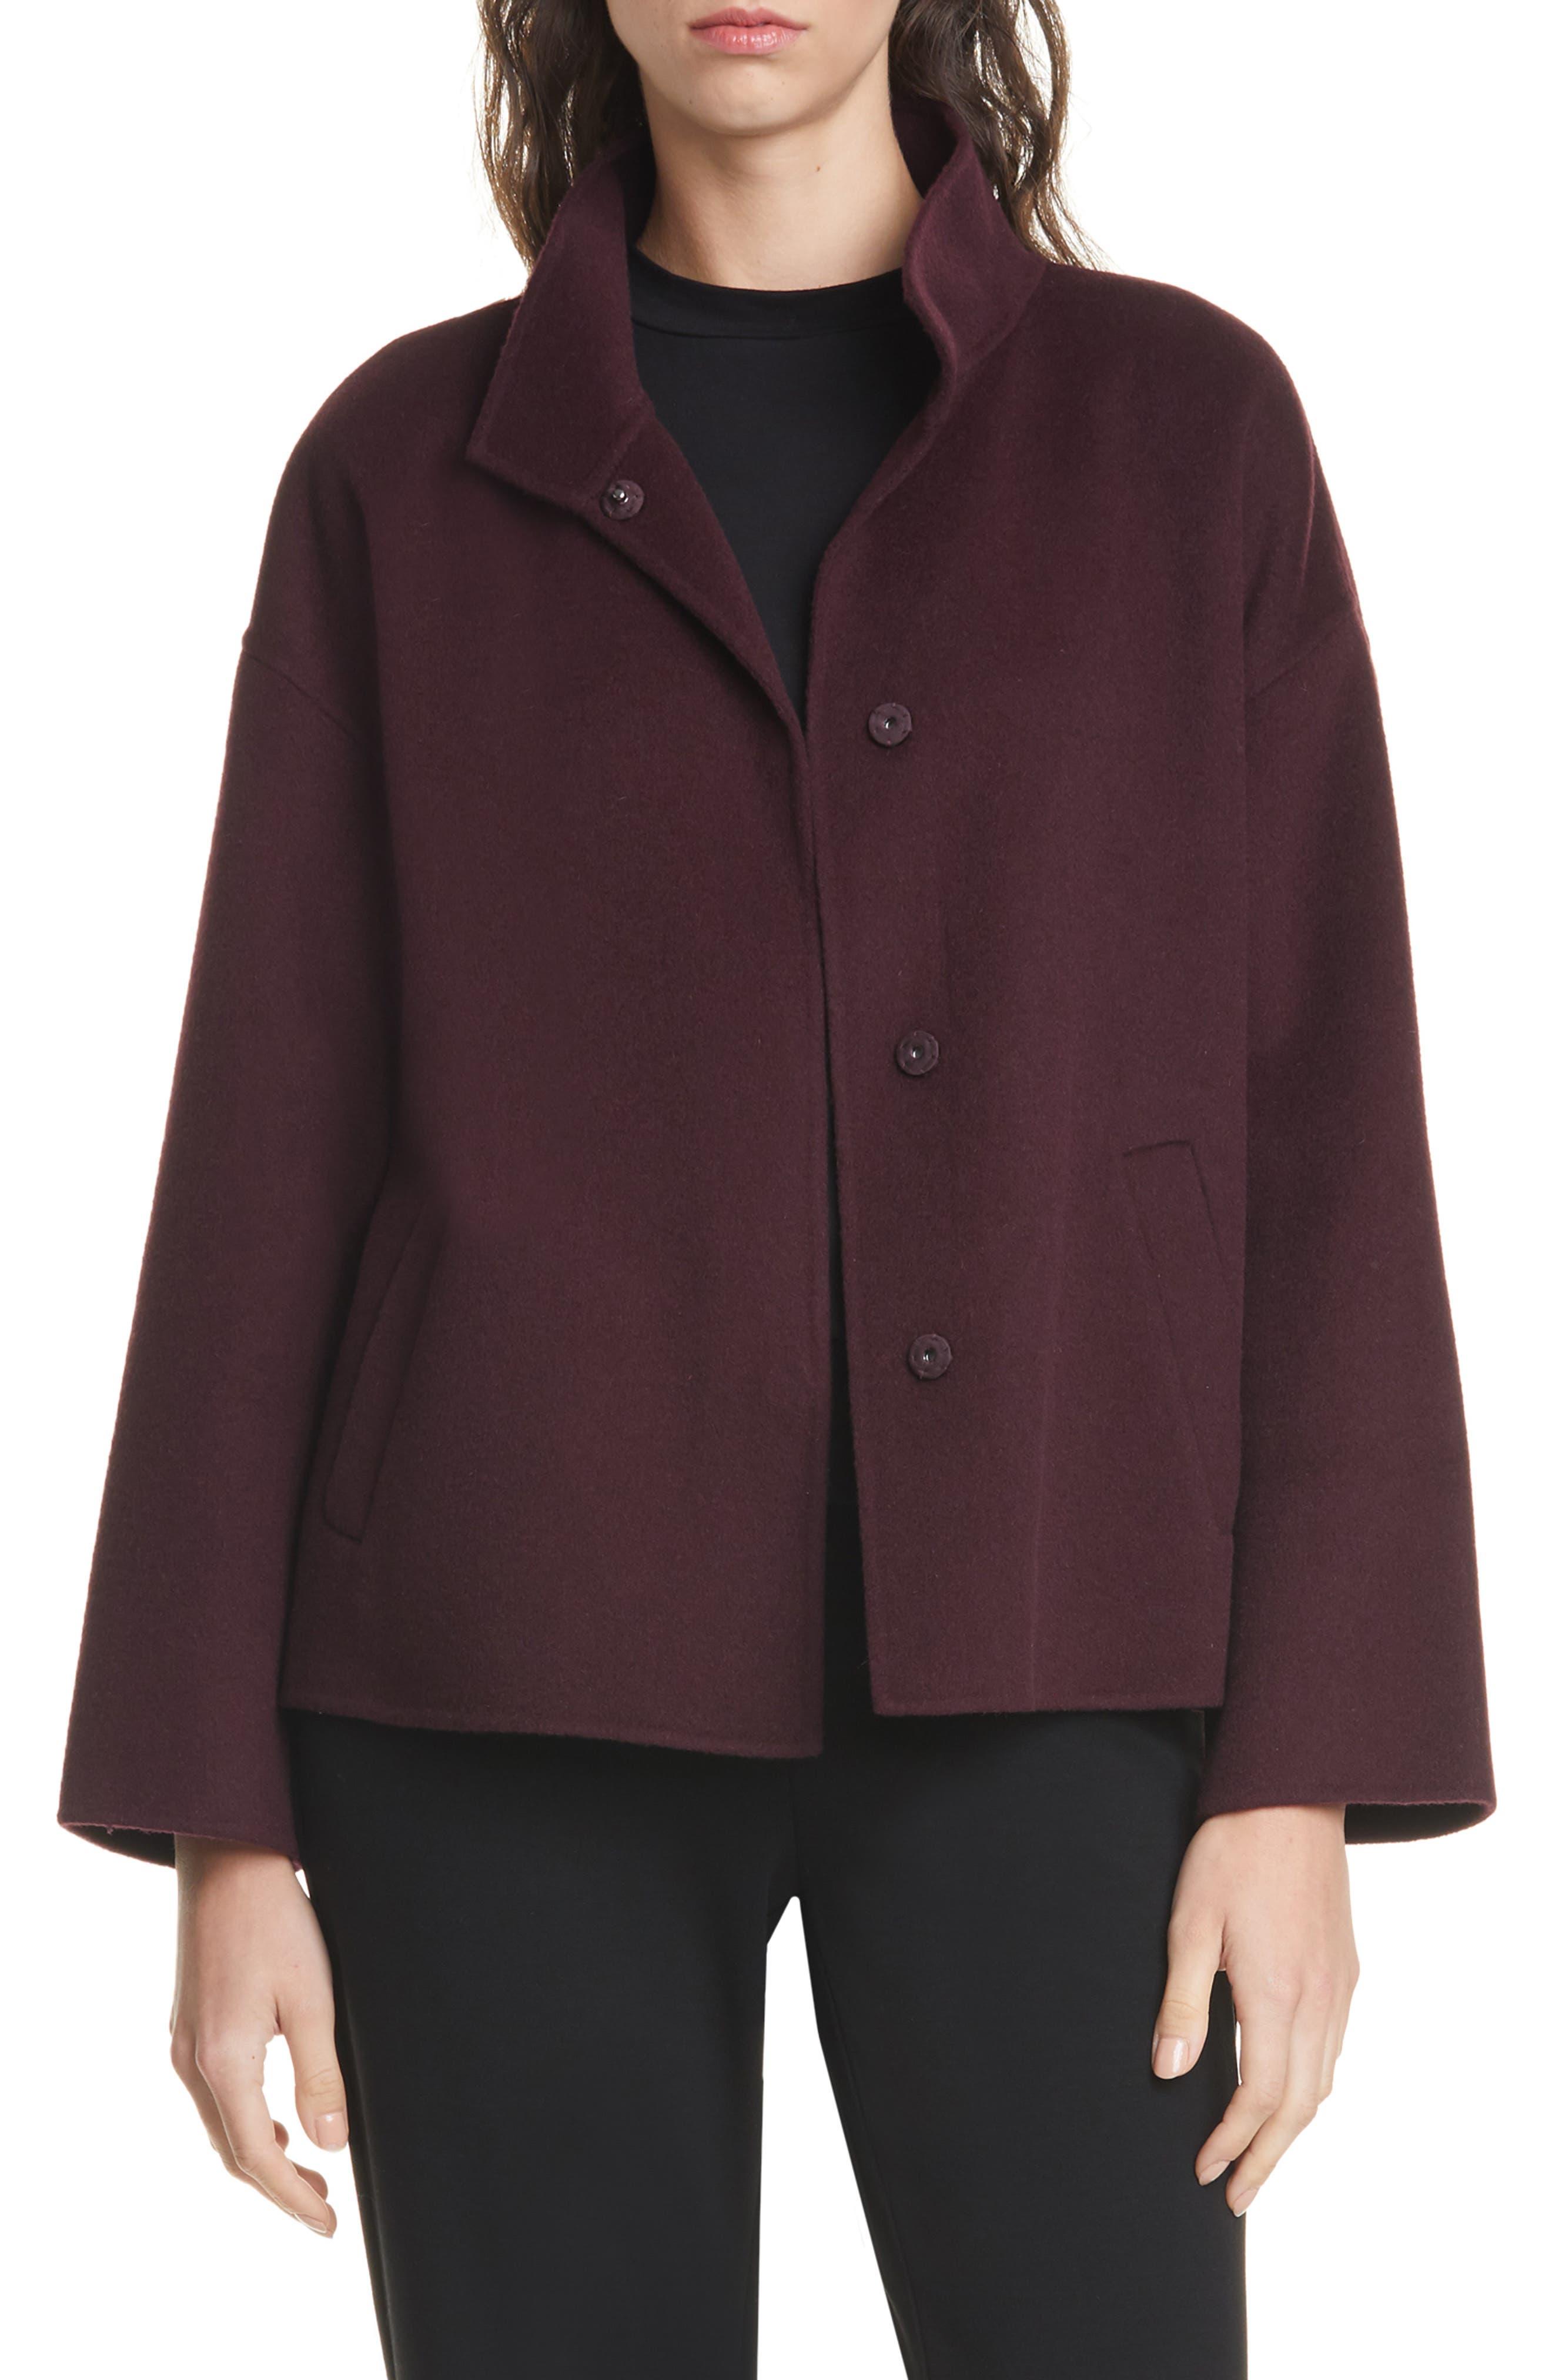 Eileen Fisher Coats Stand Collar Boxy Coat